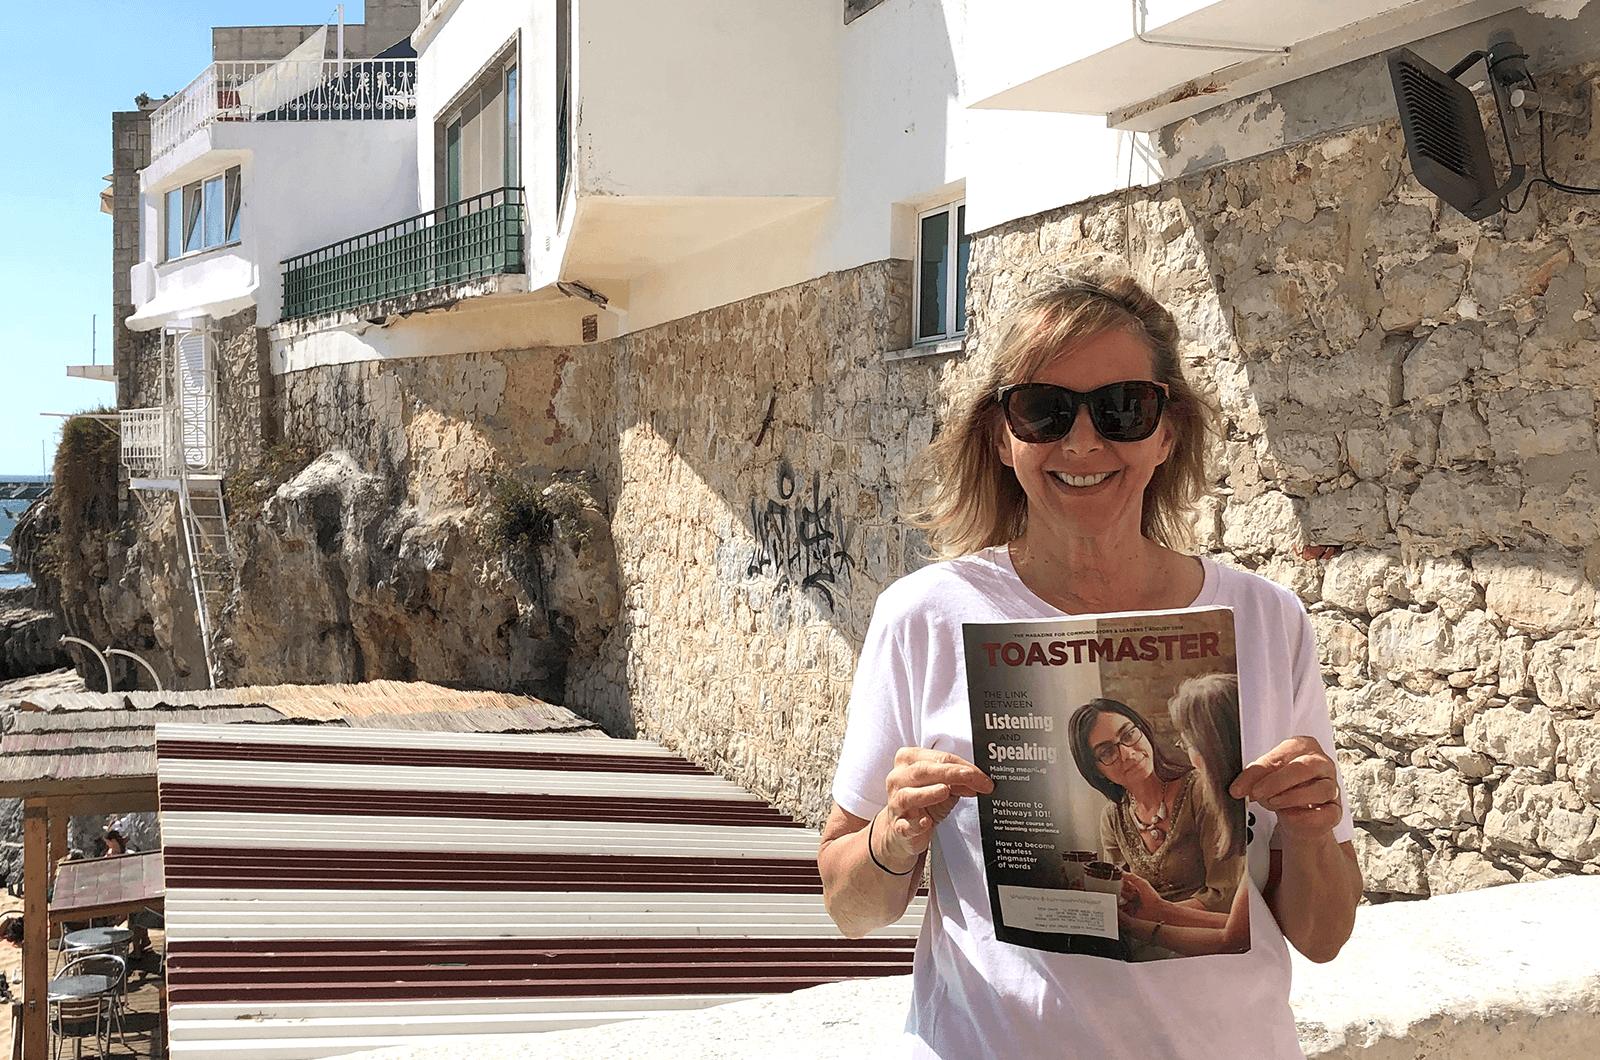 Liz Trendowski of Ponte Vedra Beach, Florida, shows off her Toastmasters pride in Portugal.